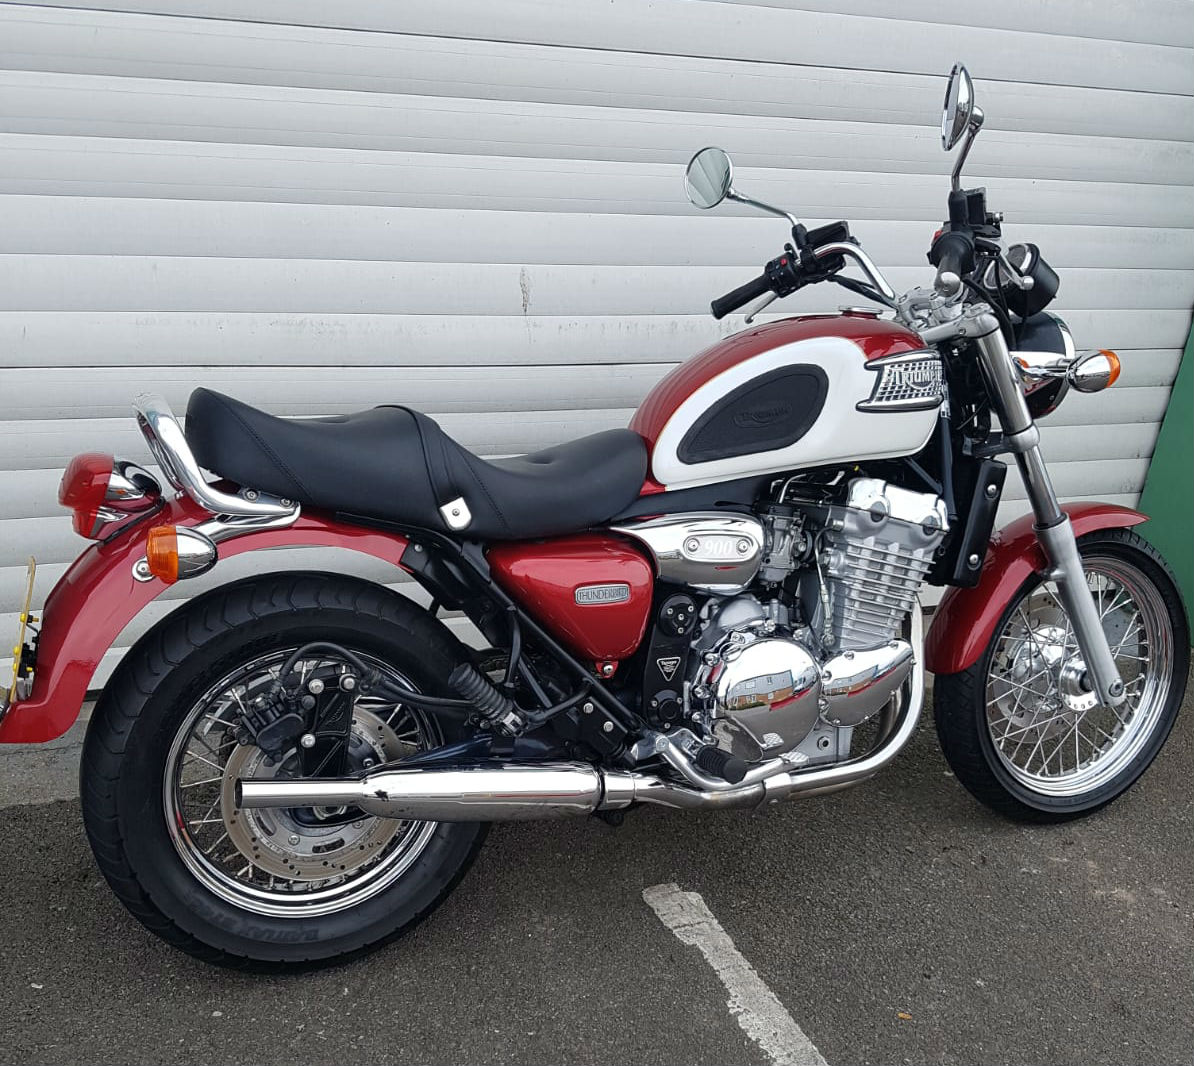 https://www.sjsmotorcycles.co.uk/wp-content/uploads/2019/11/salisbury-motorbike-dealer-7-2.jpg